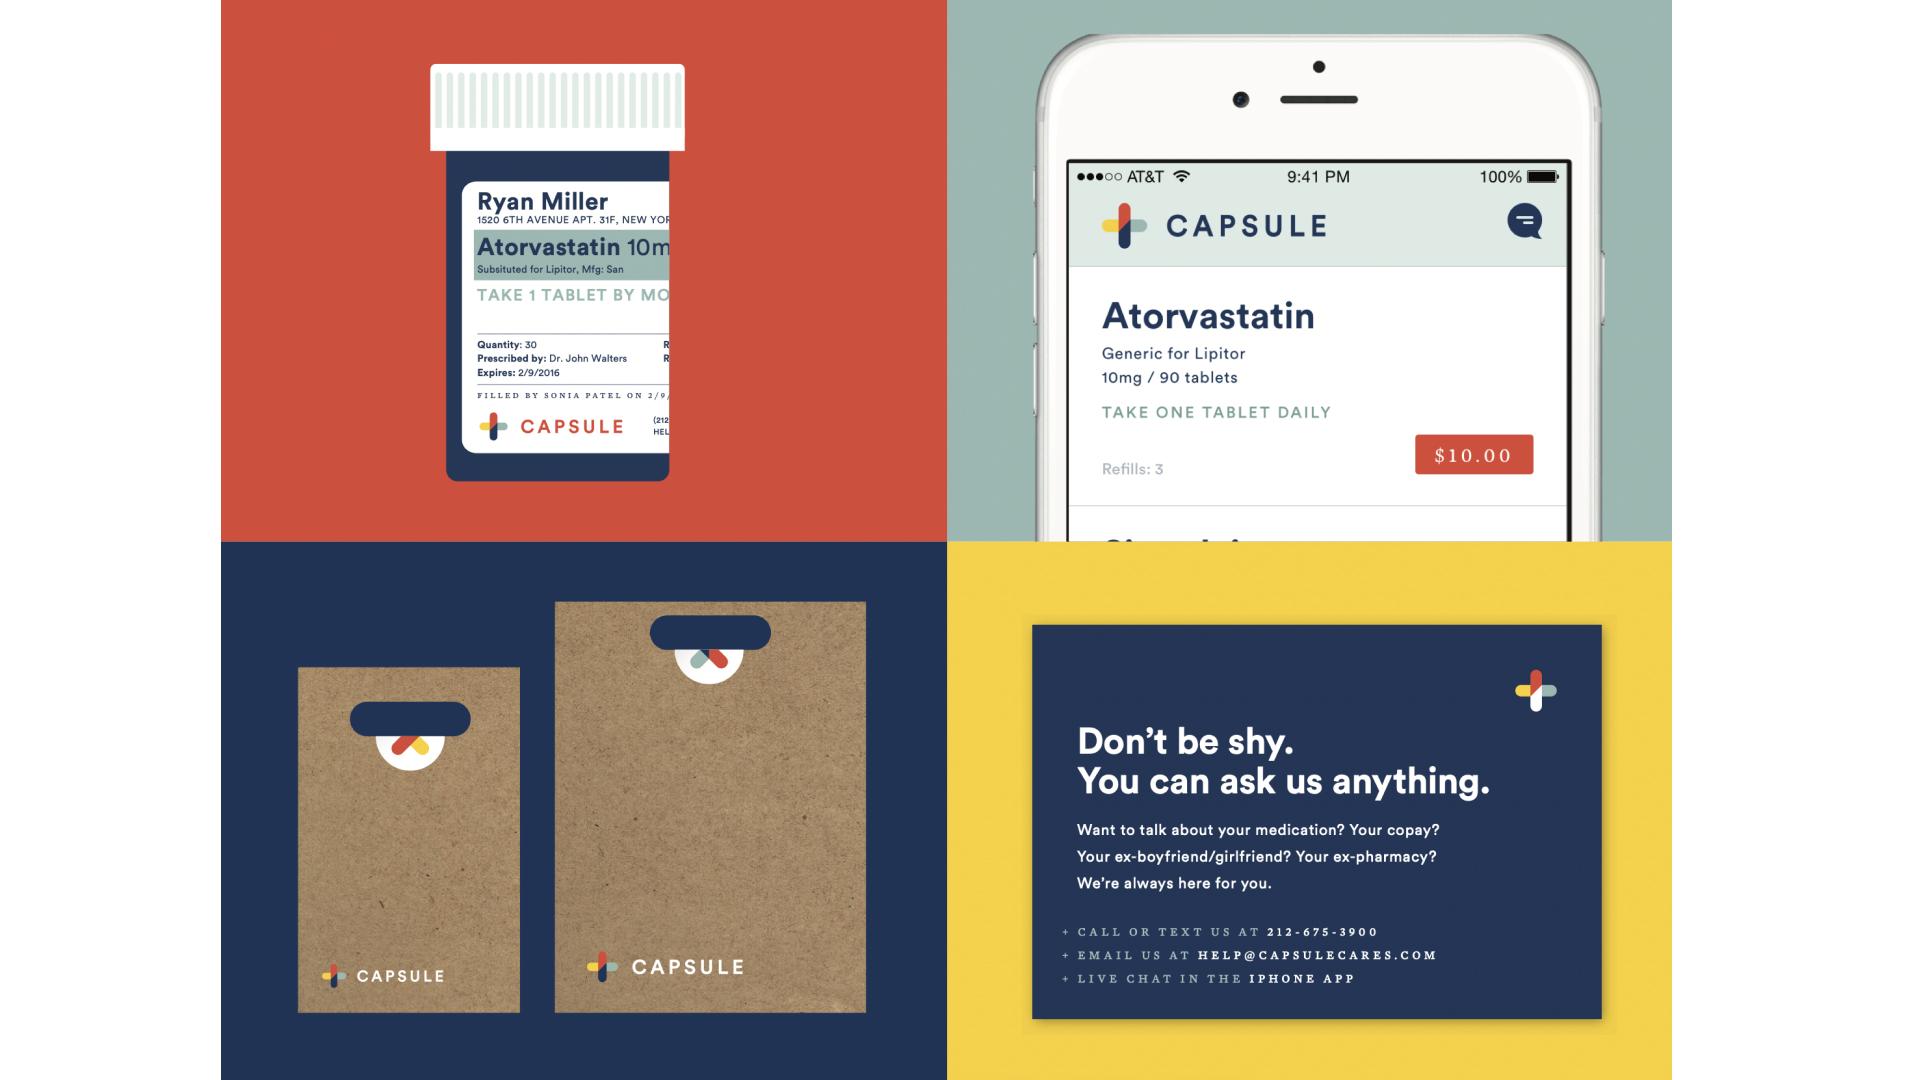 nyc-startups-capsule